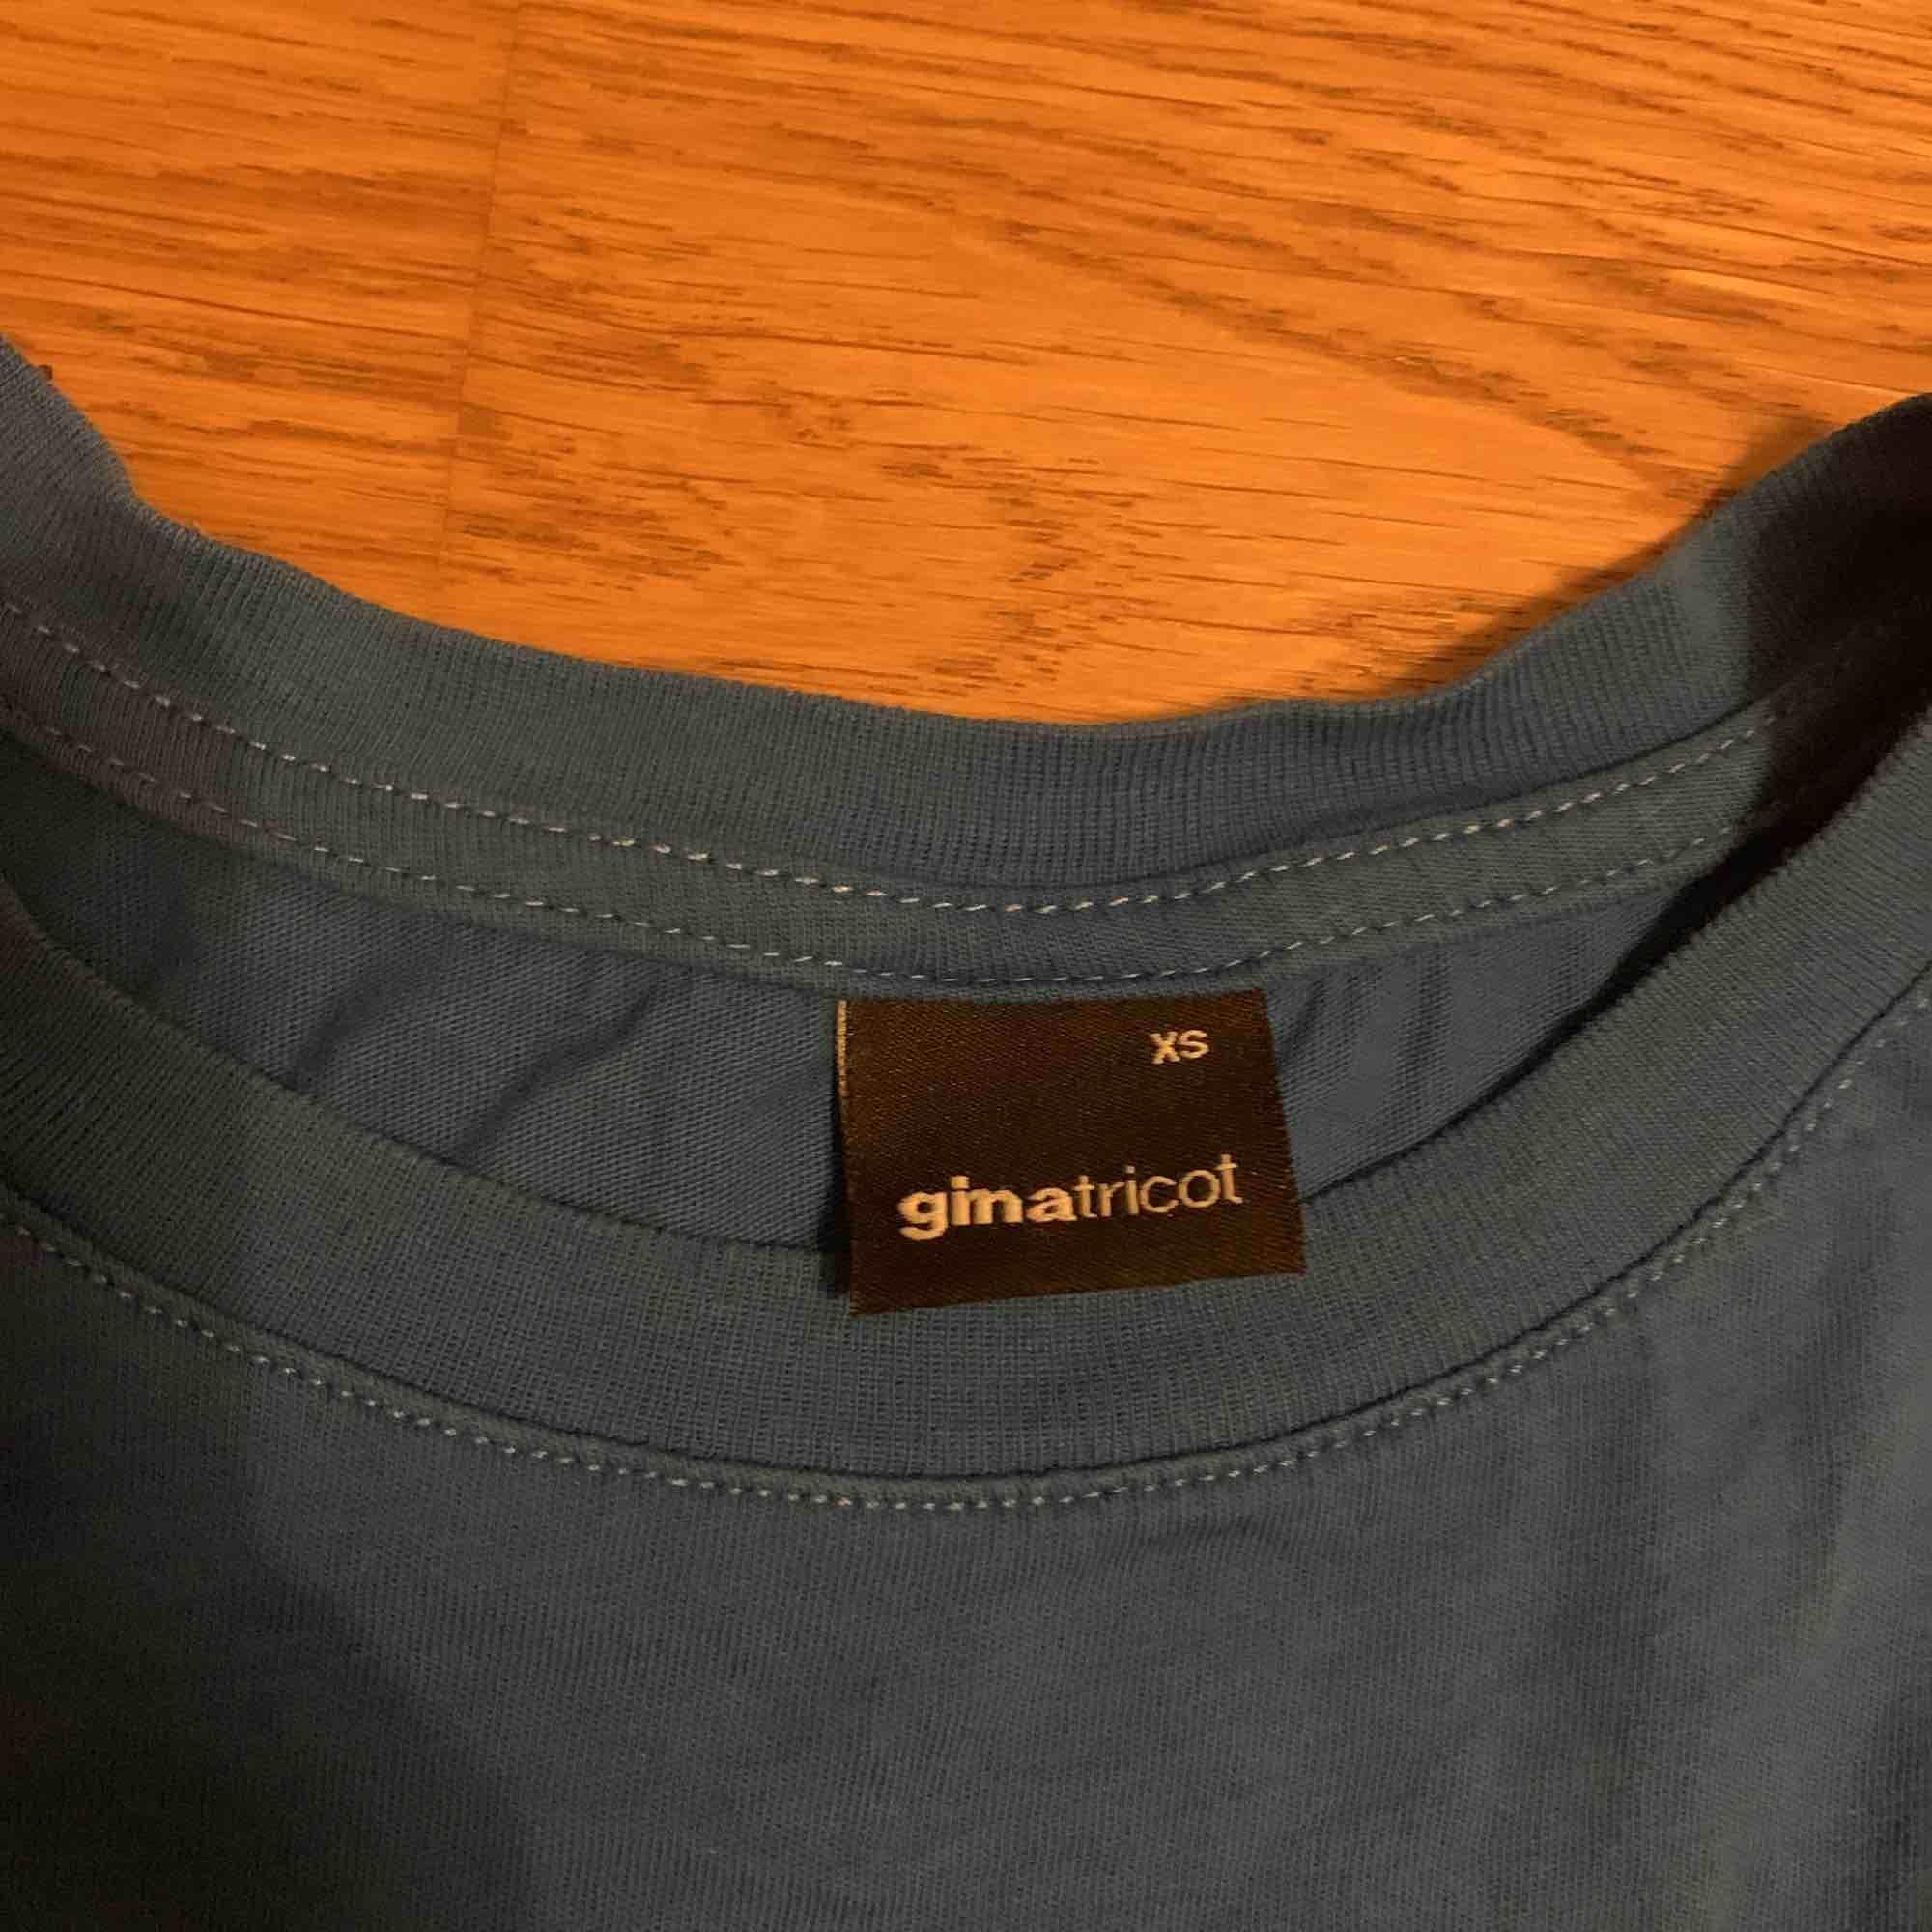 Blå T-shirt från ginatricot. Frakt 10kr. T-shirts.